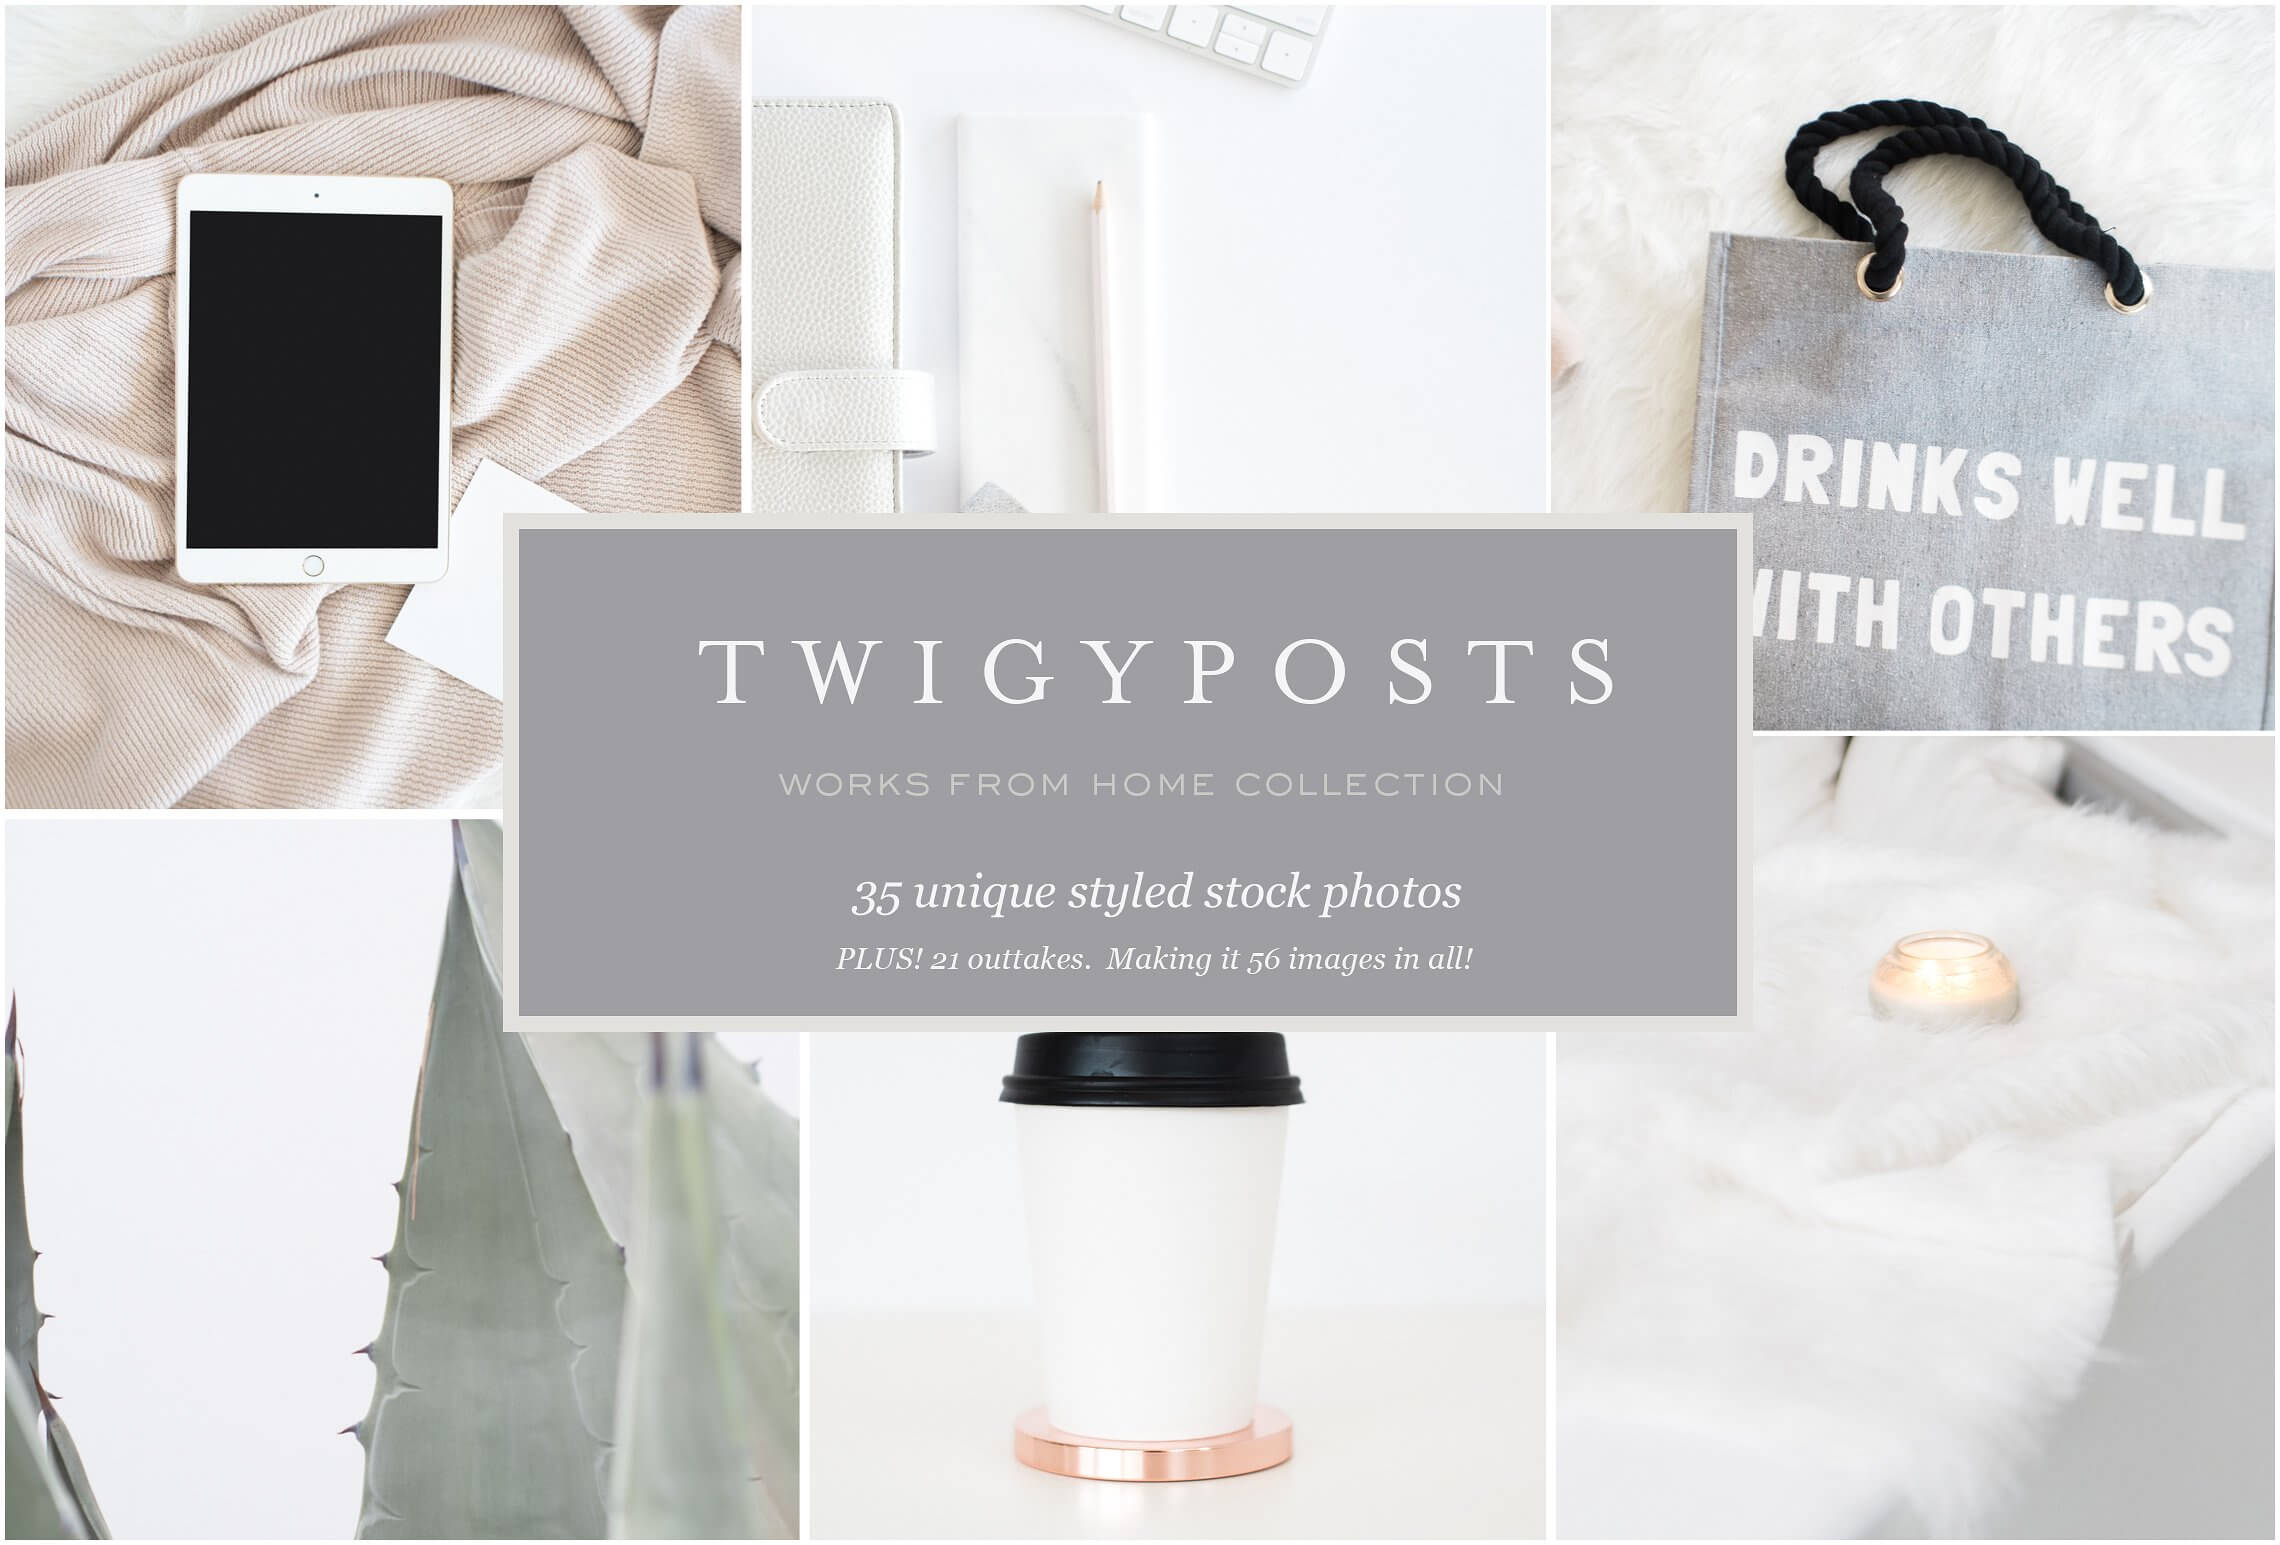 crisp stock photos for lifestyle bloggers (1).jpg